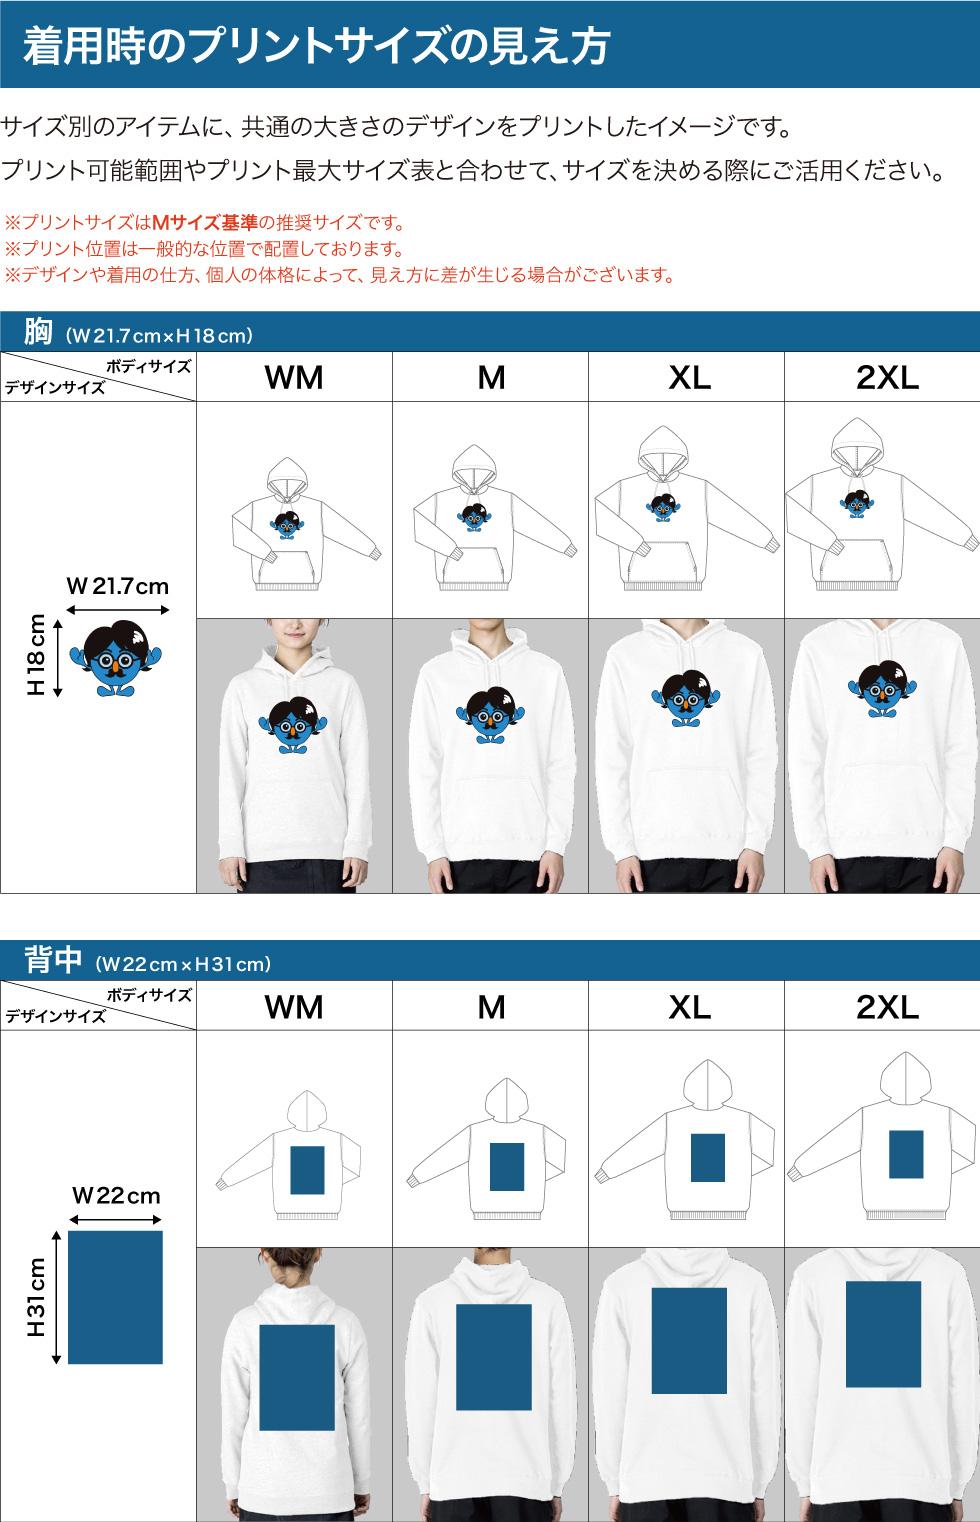 Tシャツ着用時のプリントサイズの見え方